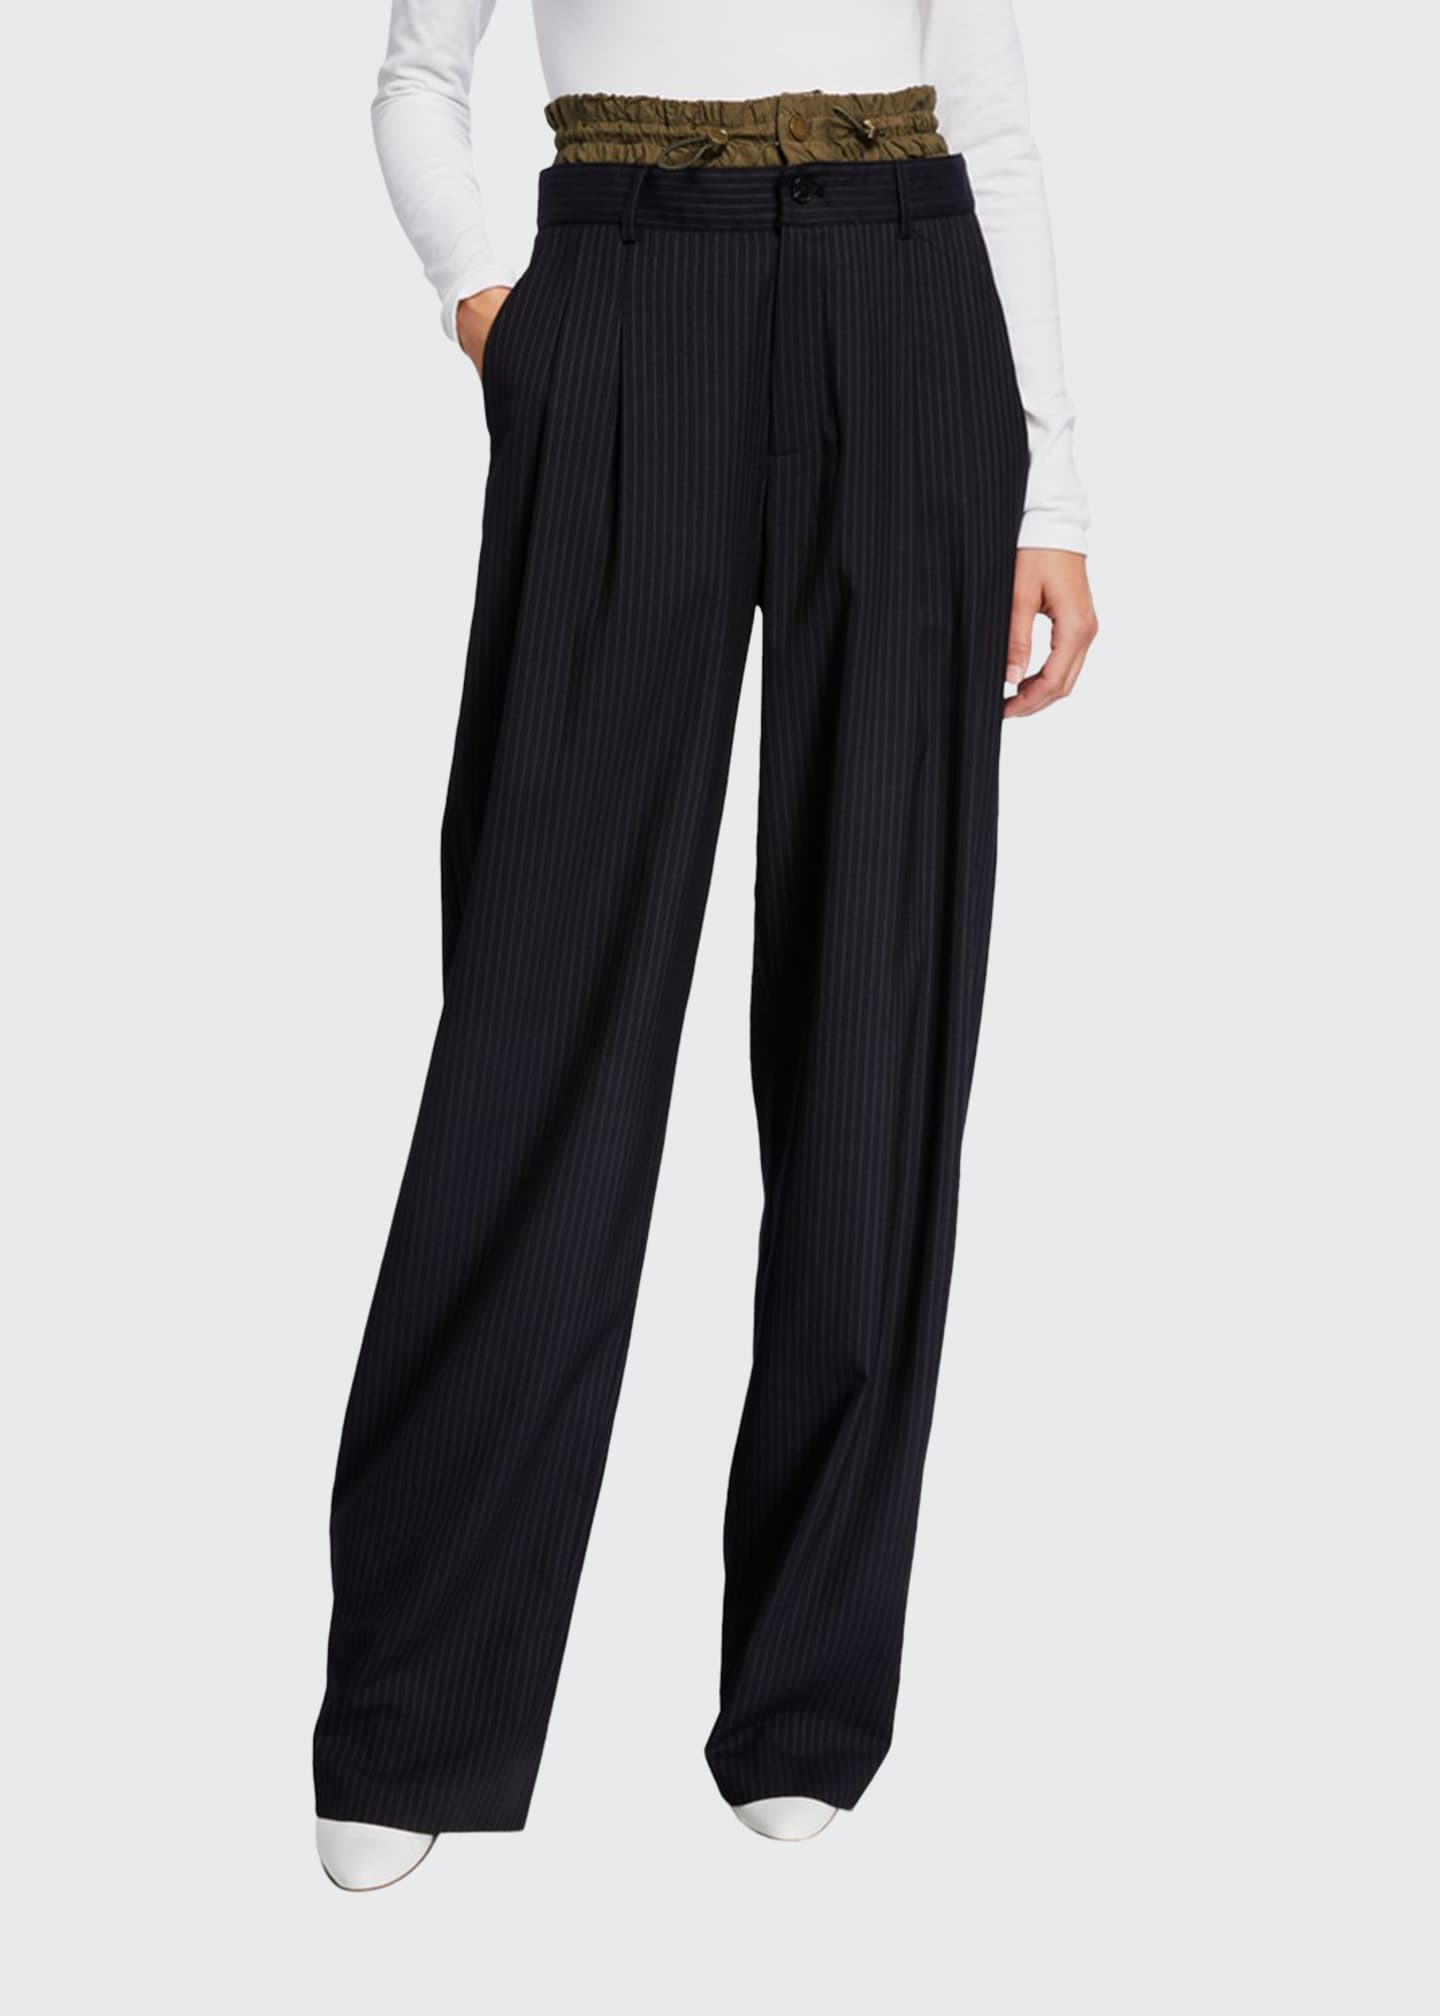 Monse Pinstriped Elastic-Waist Trousers